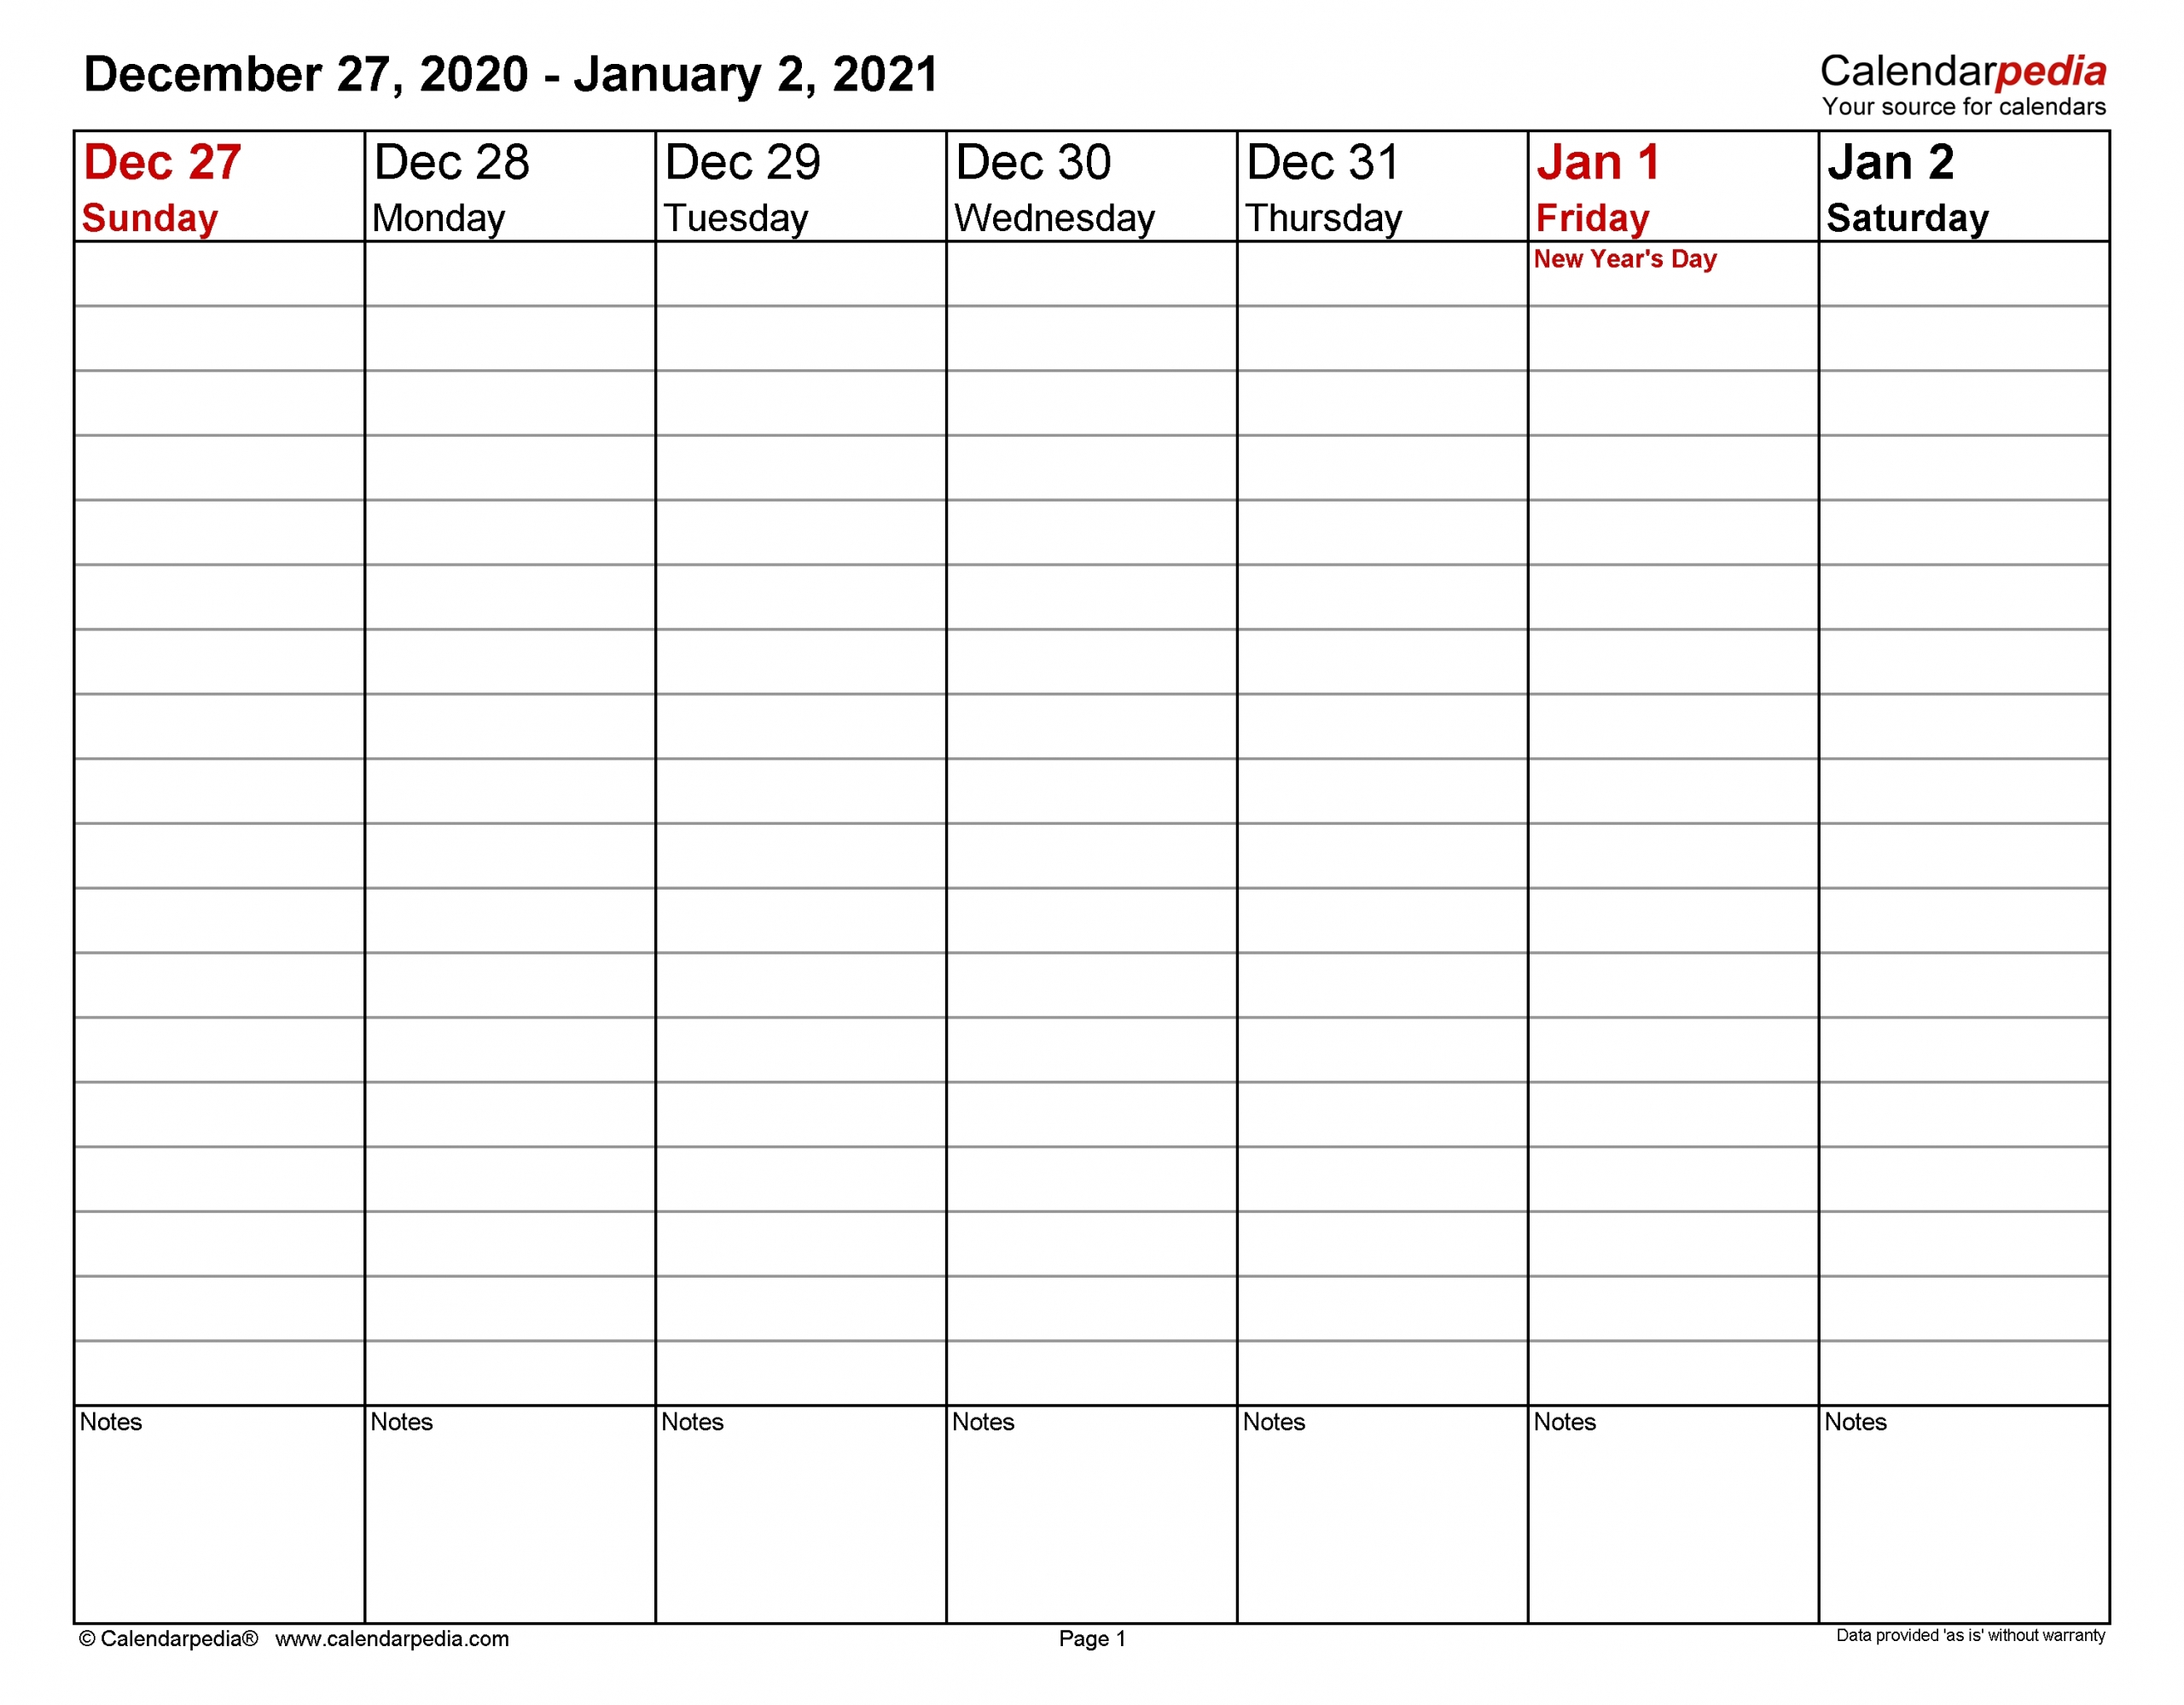 Free Printable Weekly Calendar With Time Slots 2021   Excel-2021 Printable Calendars With Time Slots